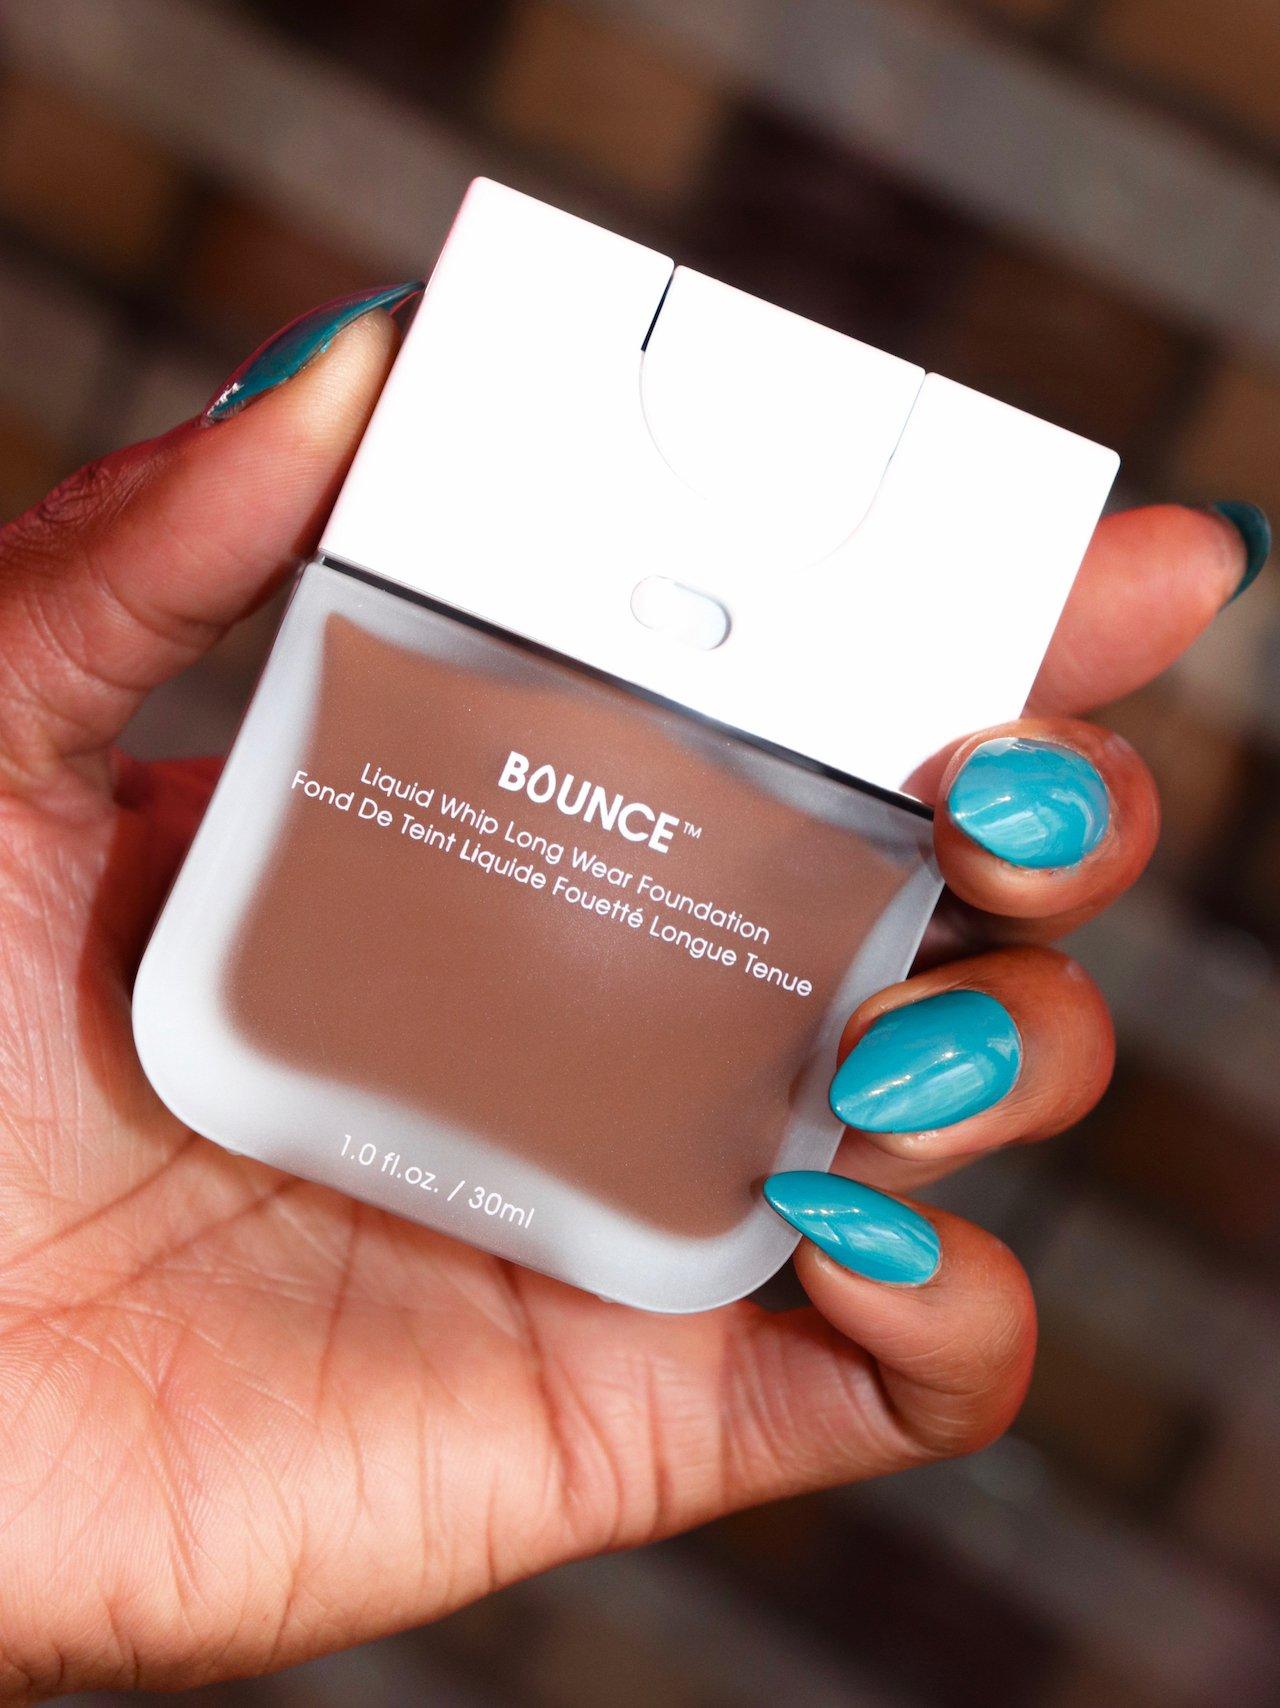 Bounce Liquid Whip Long Wear Foundation by beautyblender #3